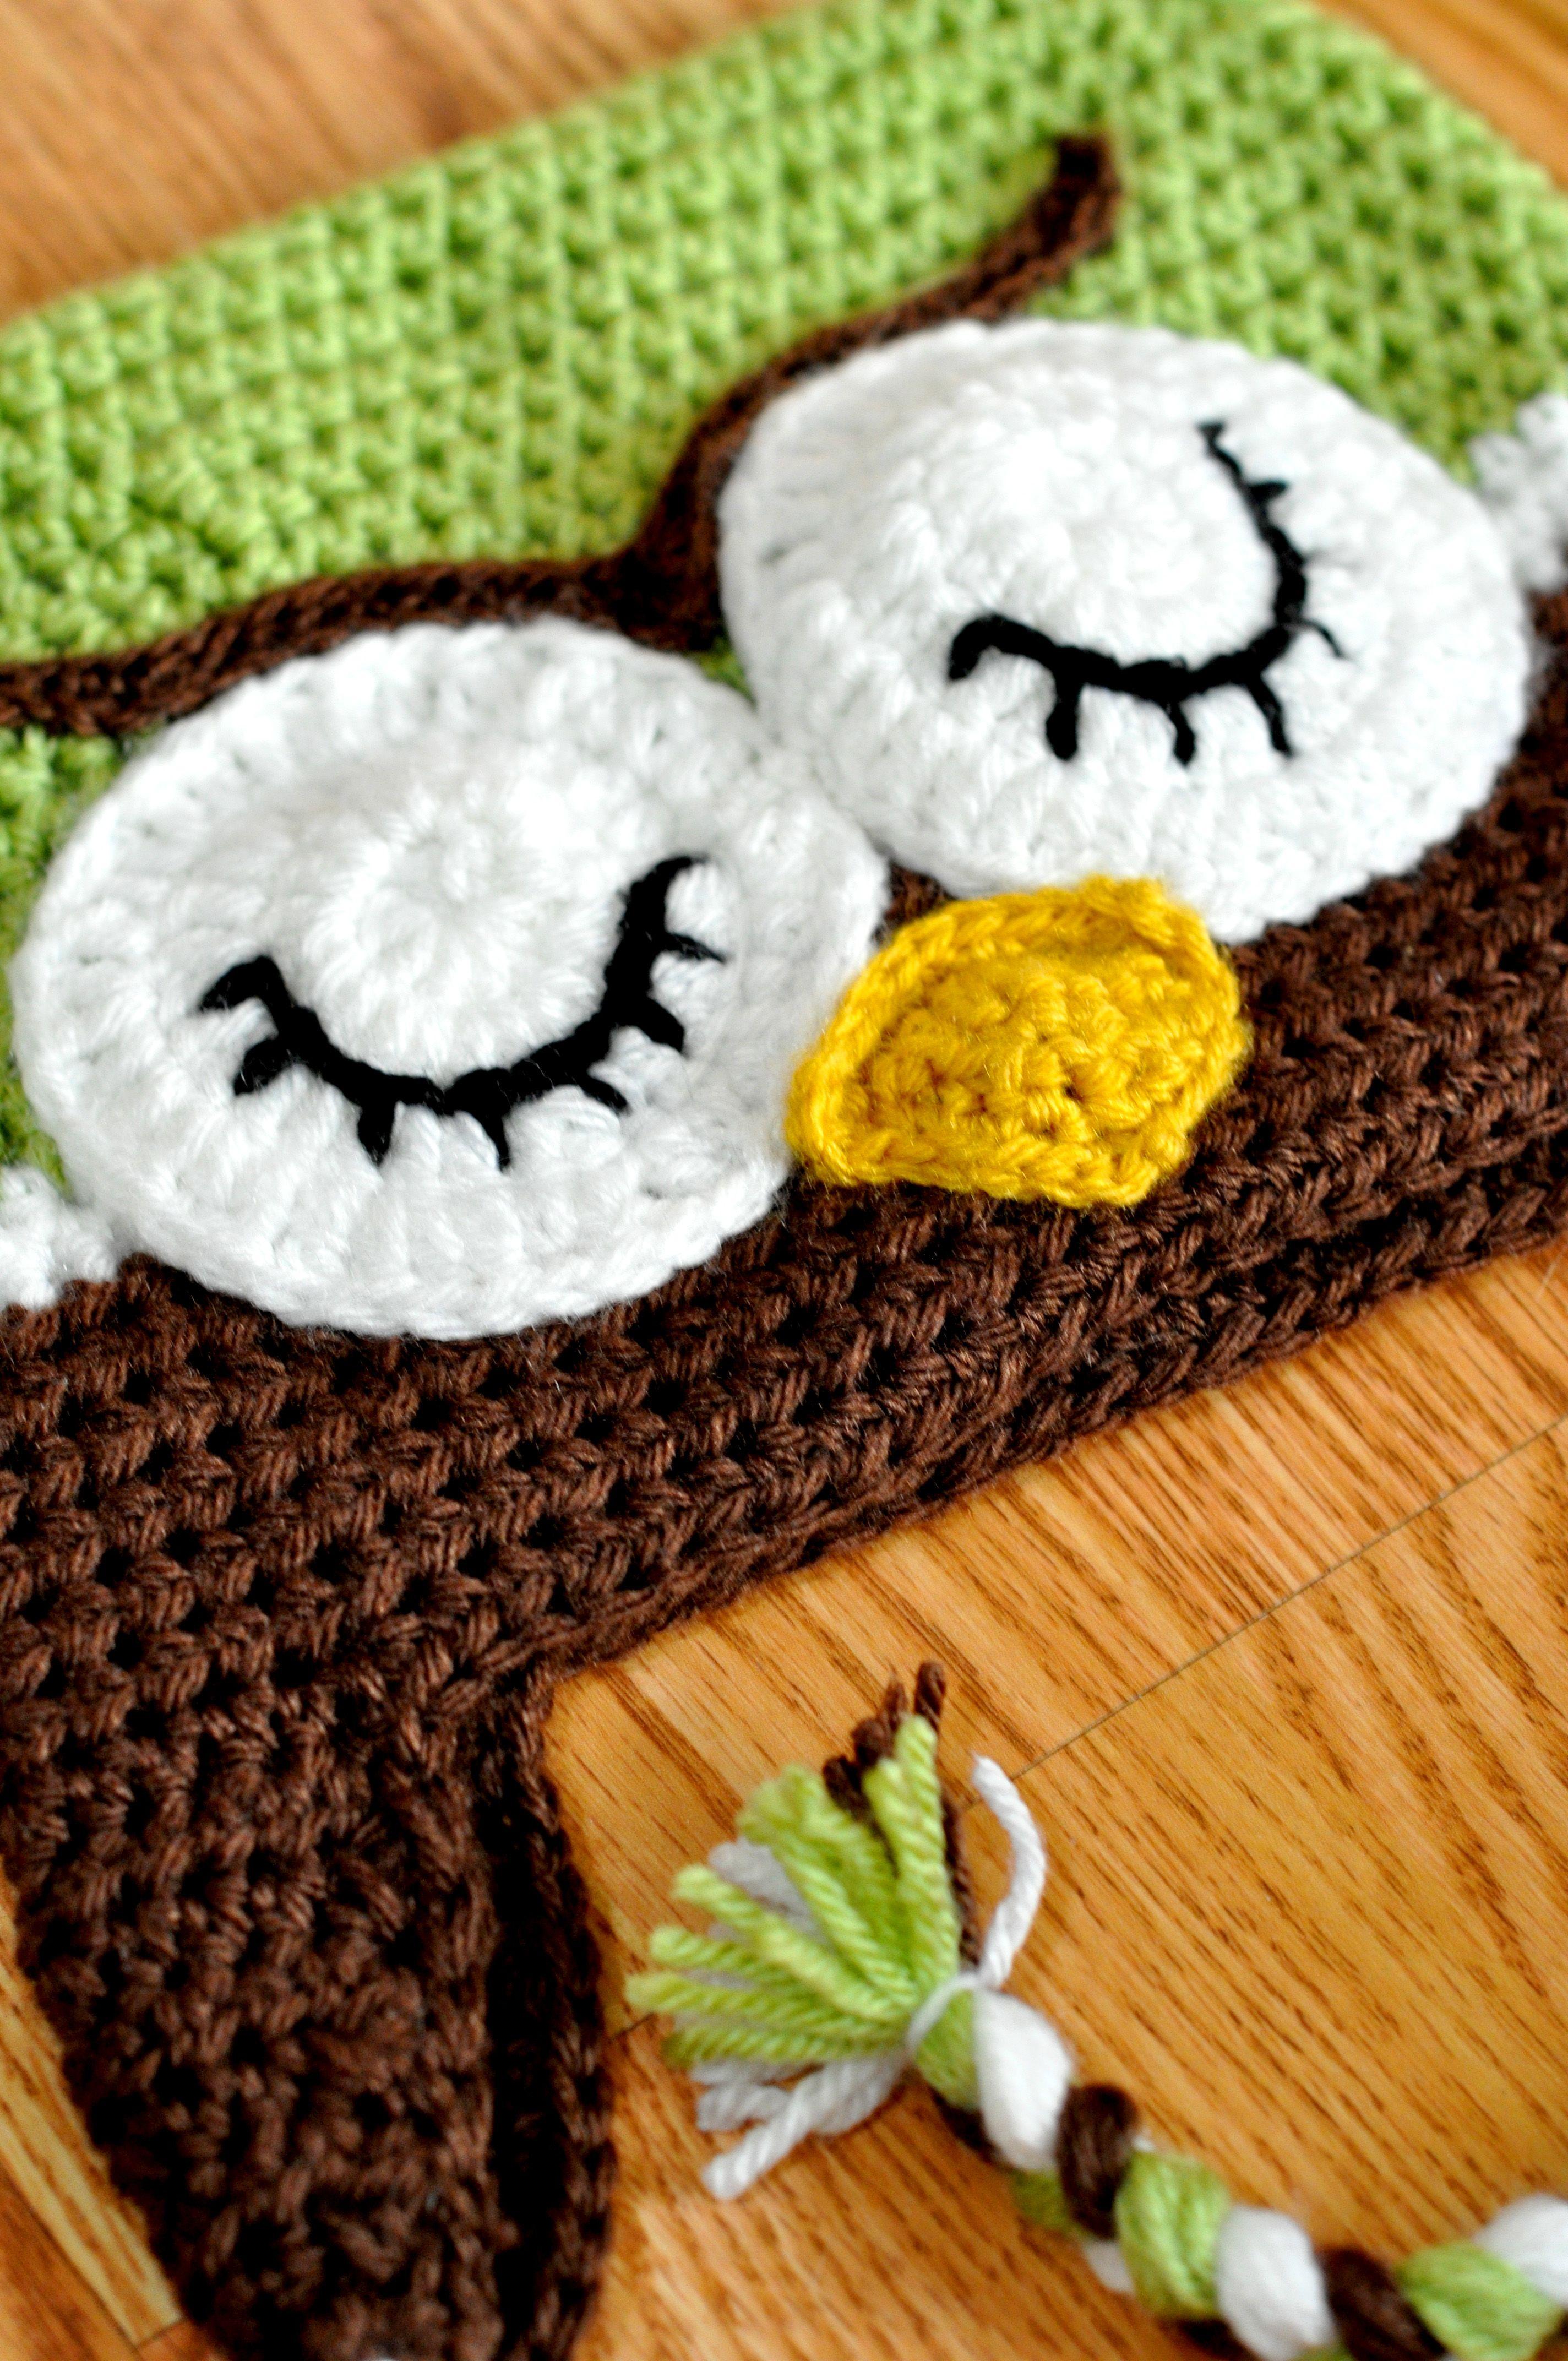 Crochet Patterns Owl Hat : Crochet Owl Hat Crochet Inspiration Pinterest